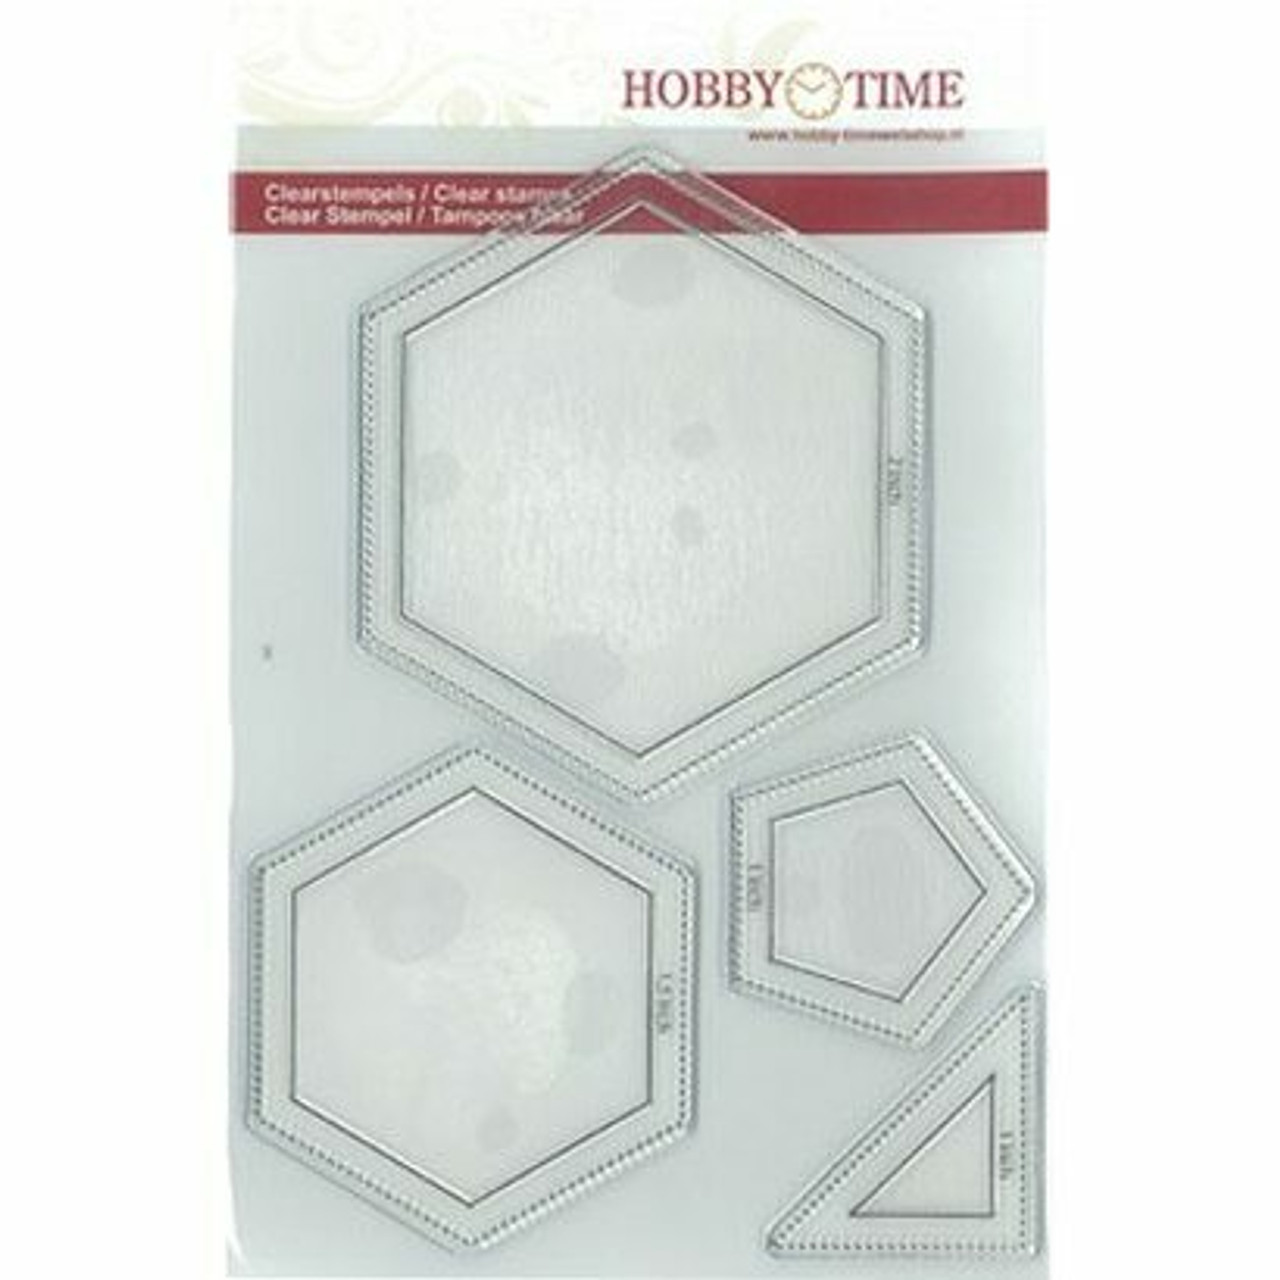 Hobby Time Big Hexagon, Pentagon and Half Square Stamp Set